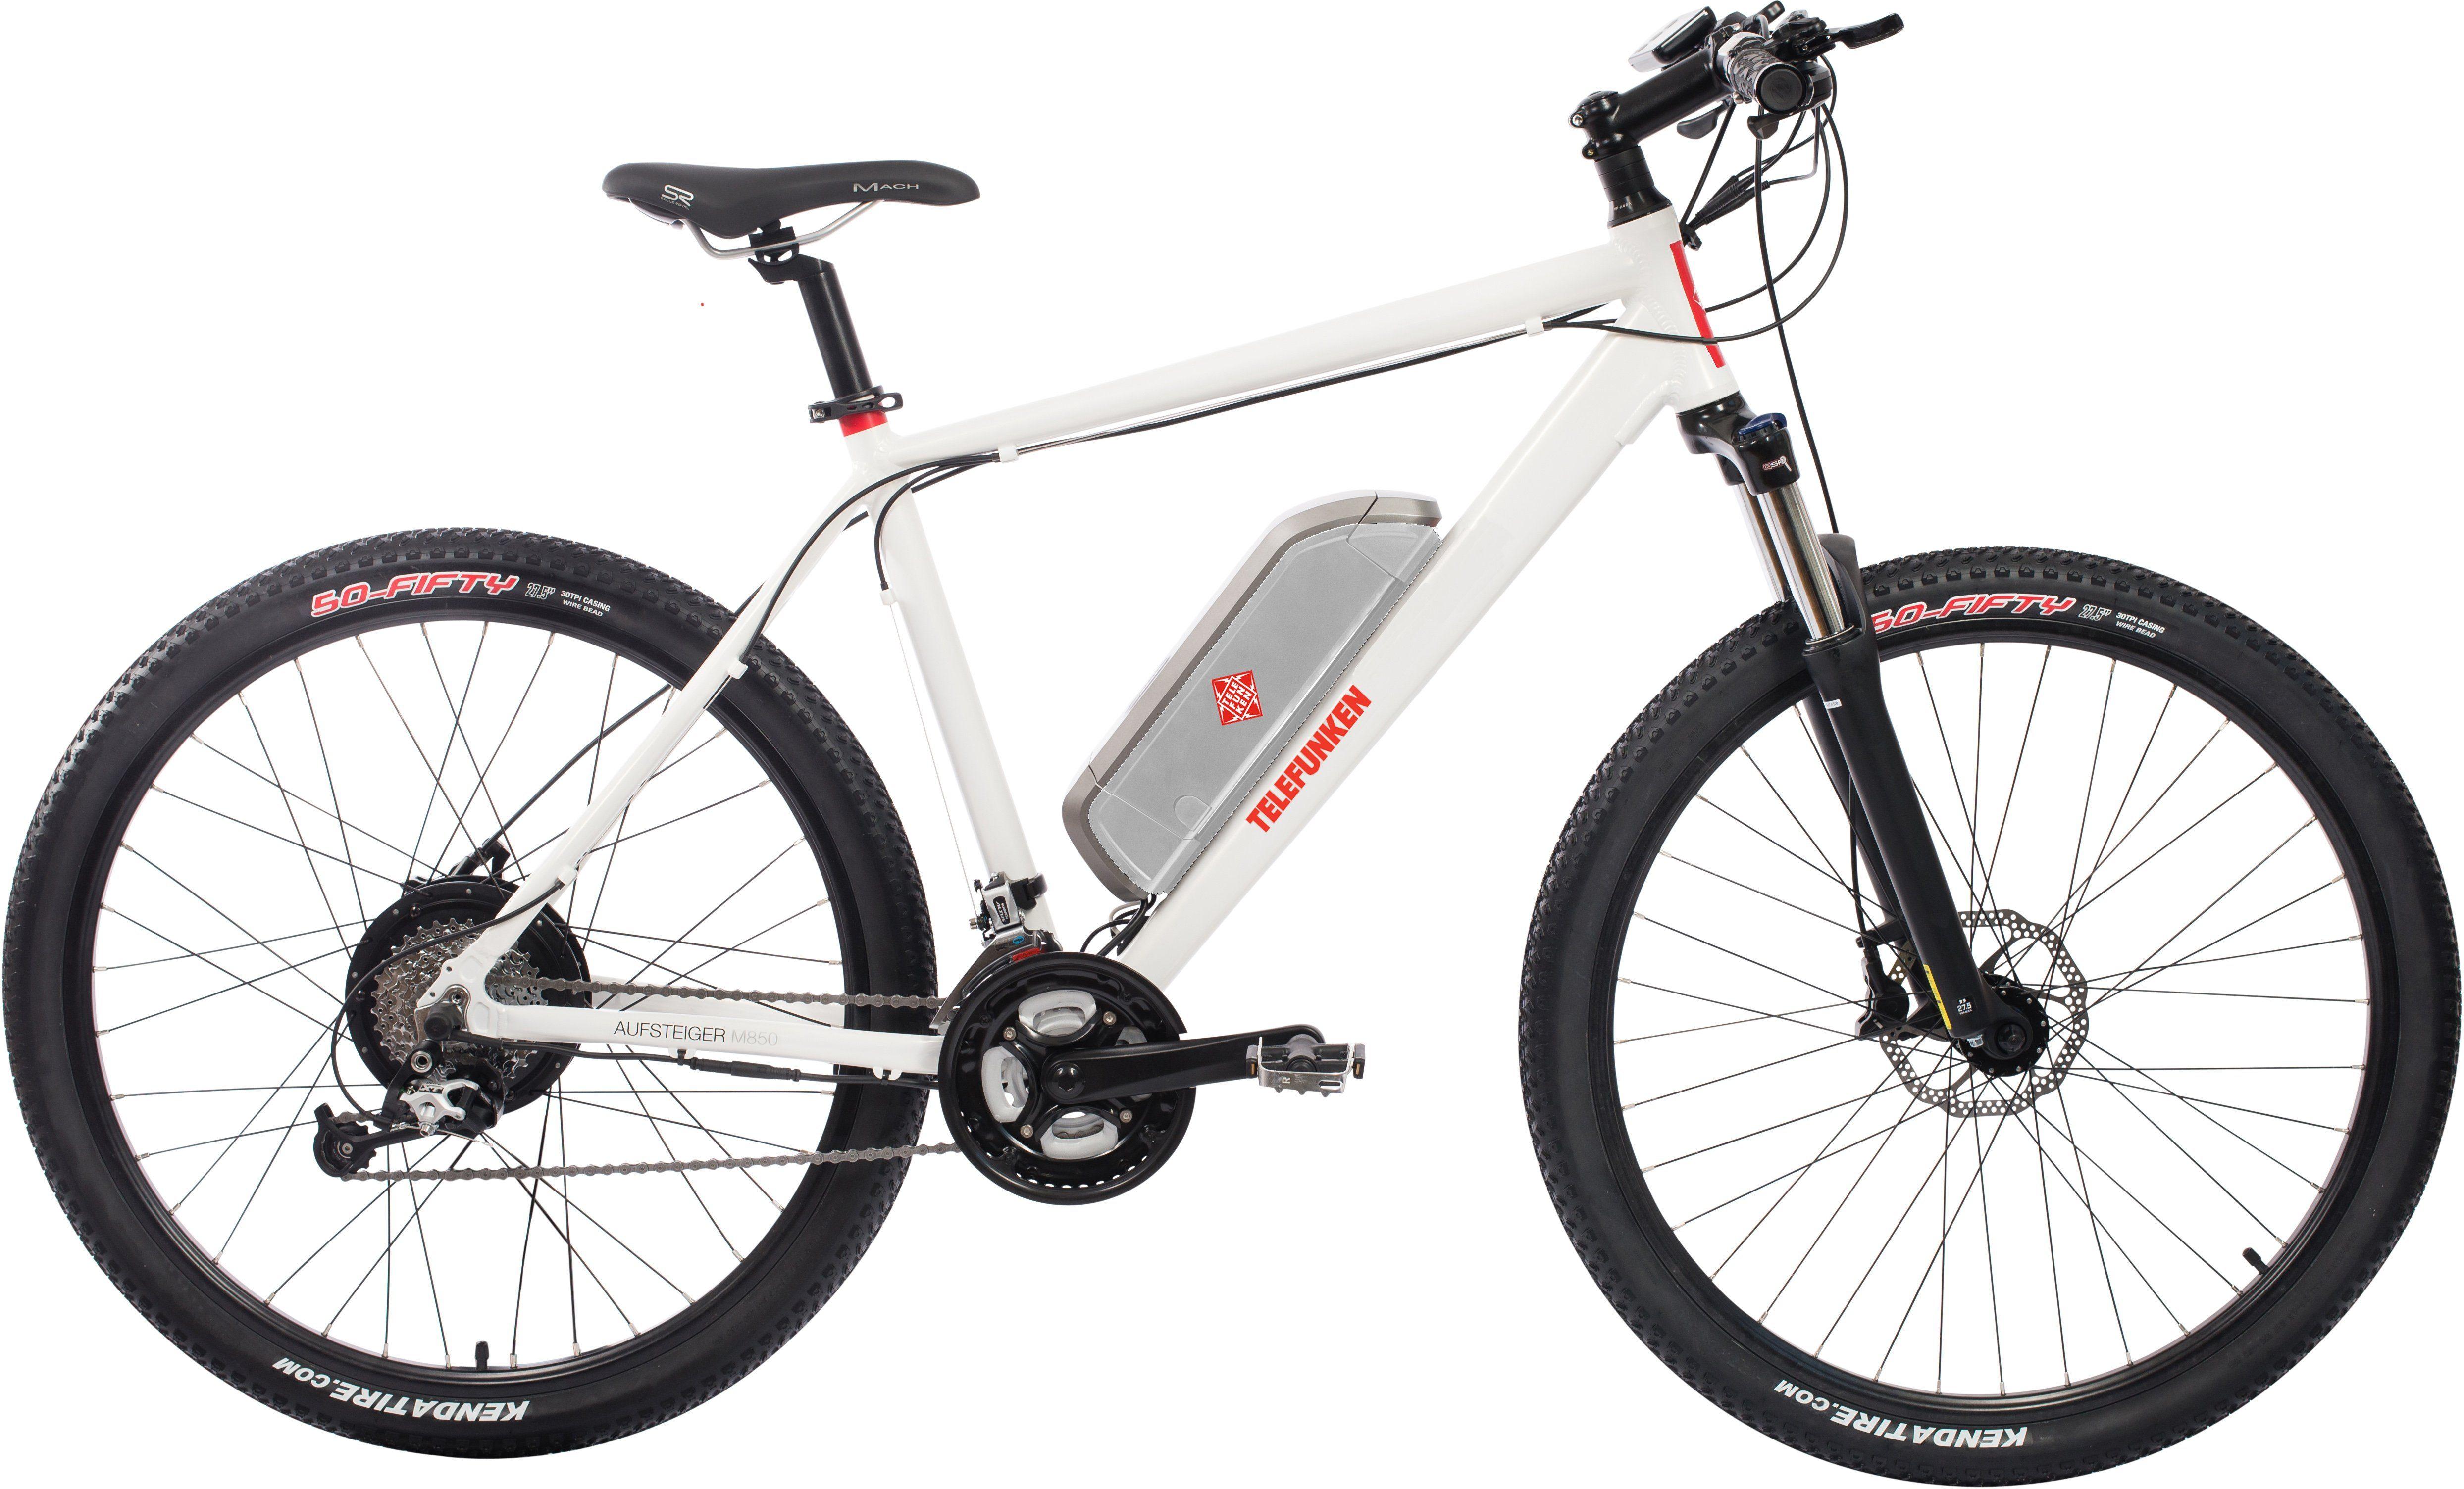 Telefunken E-Bike »Aufsteiger M850«, 27 Gang Shimano Nexus Schaltwerk, Kettenschaltung, Heckmotor 250 W